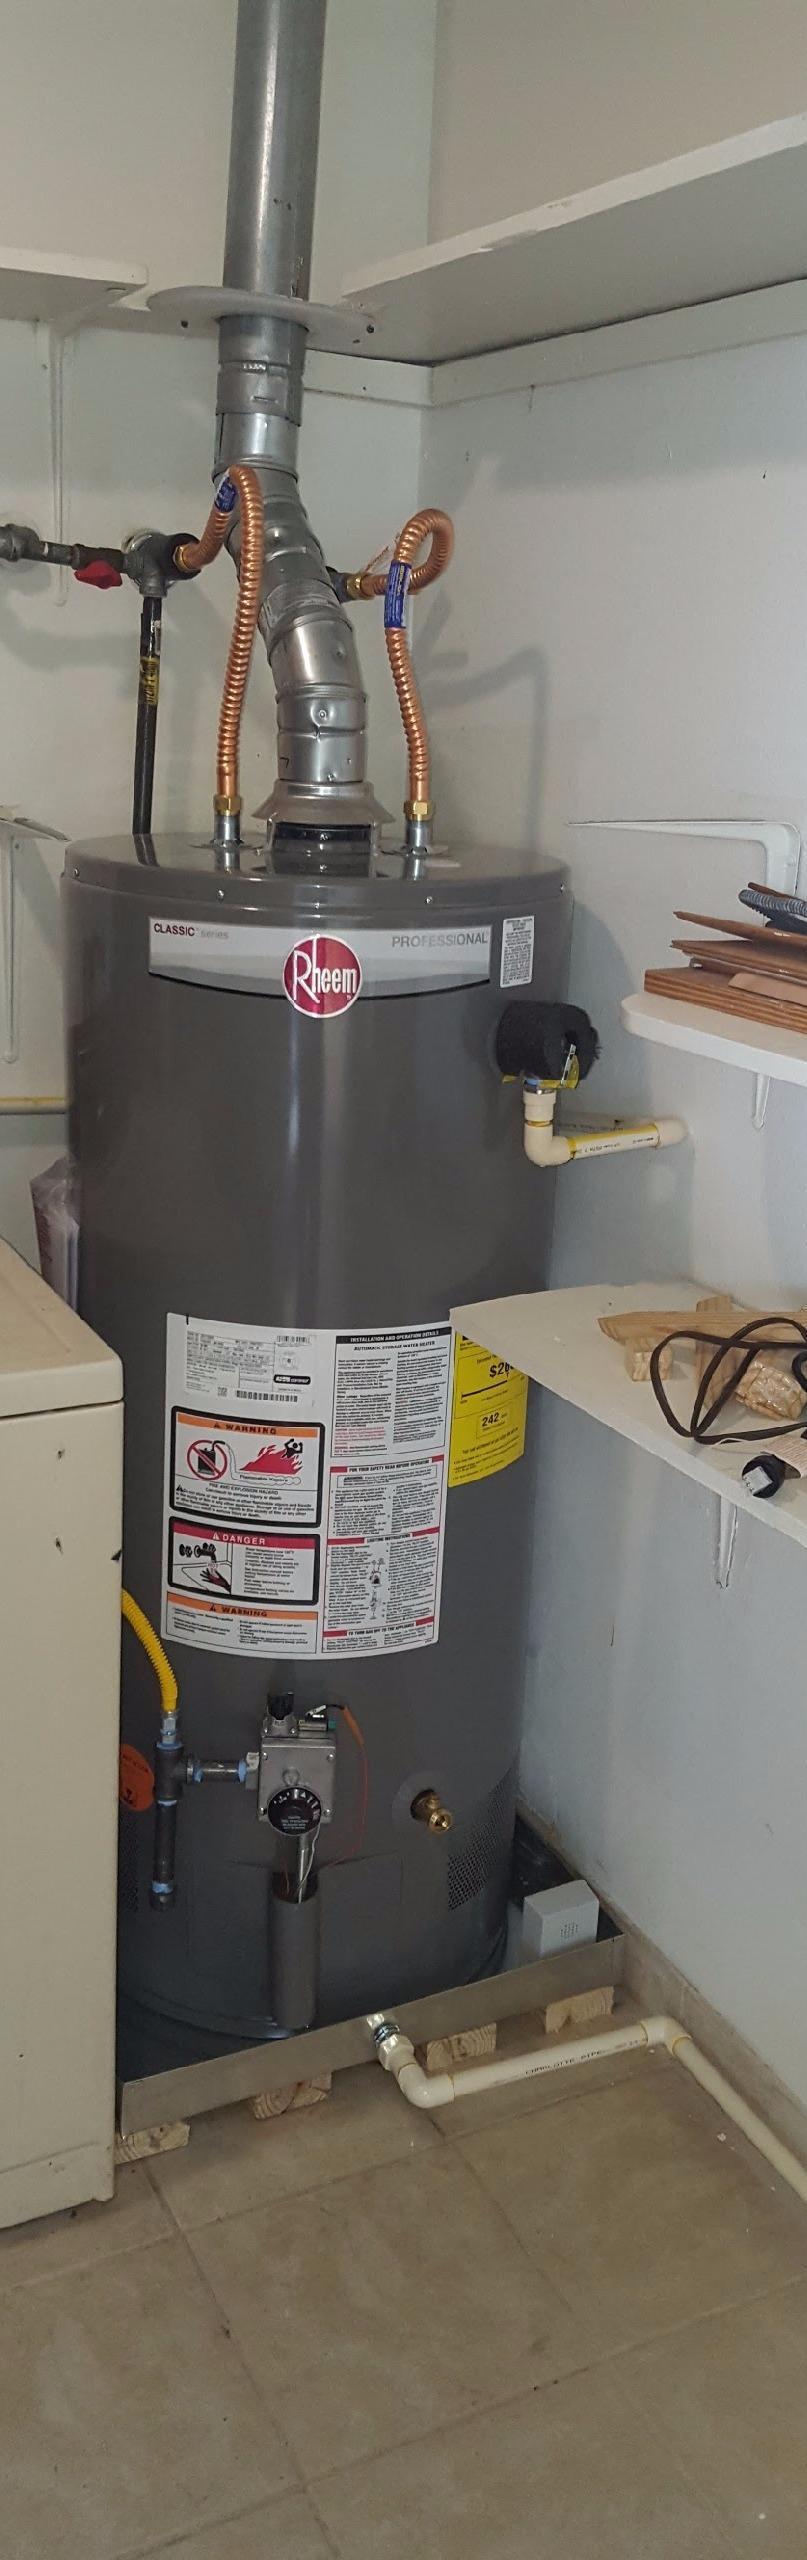 Katy Water Heaters image 65